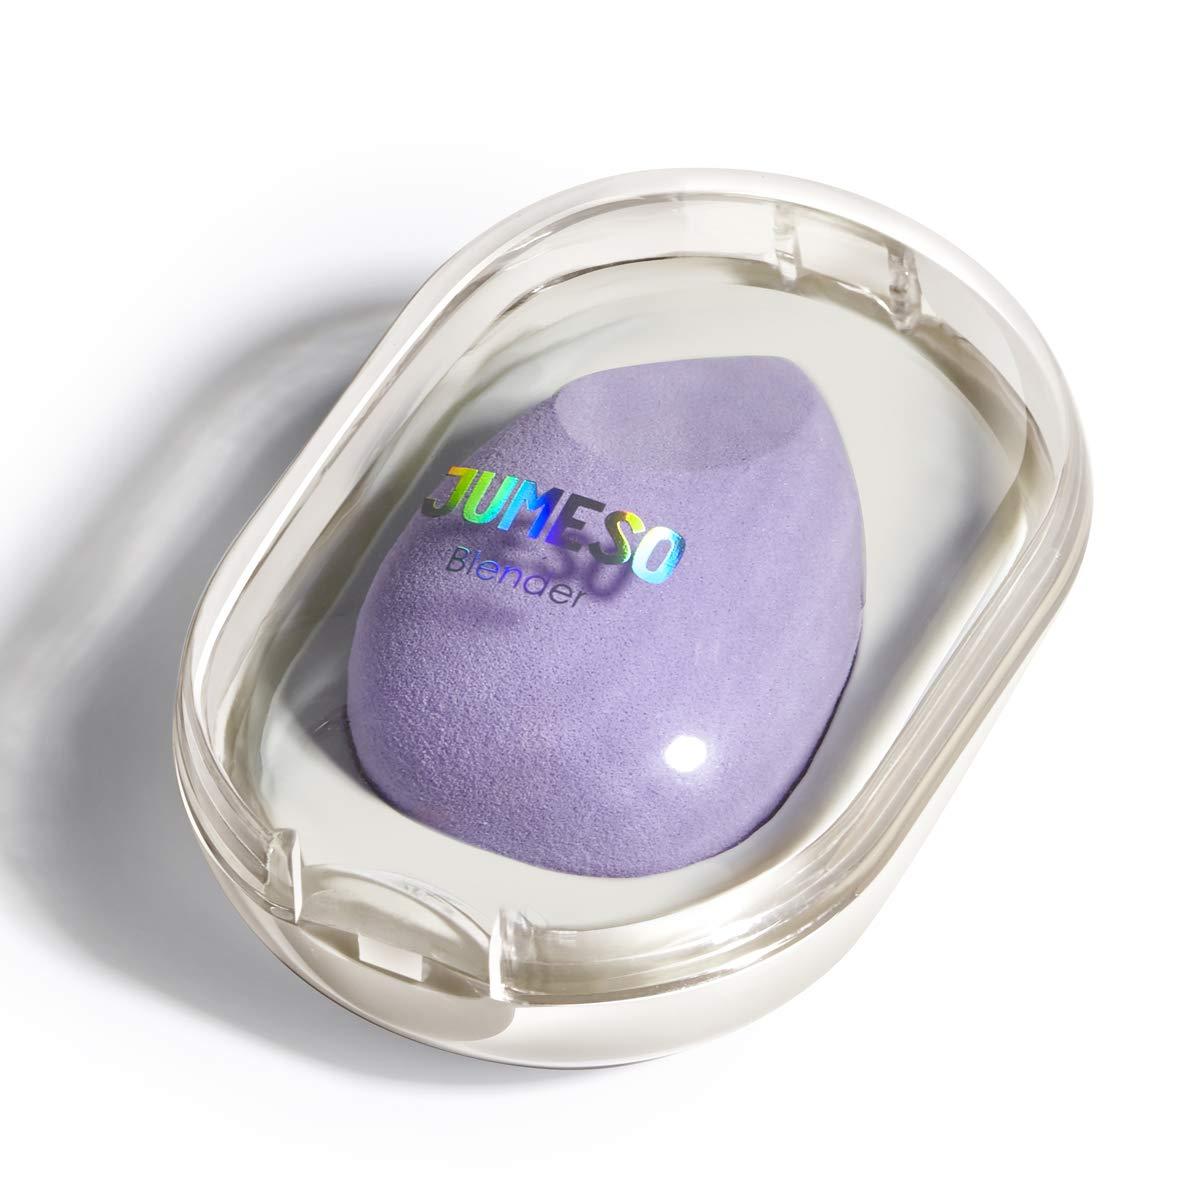 Makeup Blender Sponge - JUMESO Beauty Sponge Foundation Blending Sponge with Egg Sponge Blending Travel Case, Flawless for Liquid & Creams & Powers (Pink Purple)